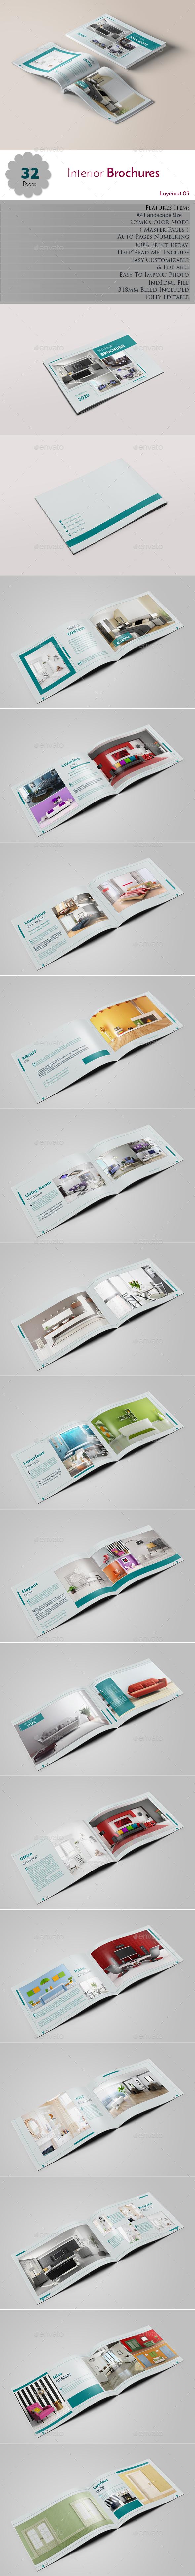 Interior Brochures Layerout 03 - Brochures Print Templates